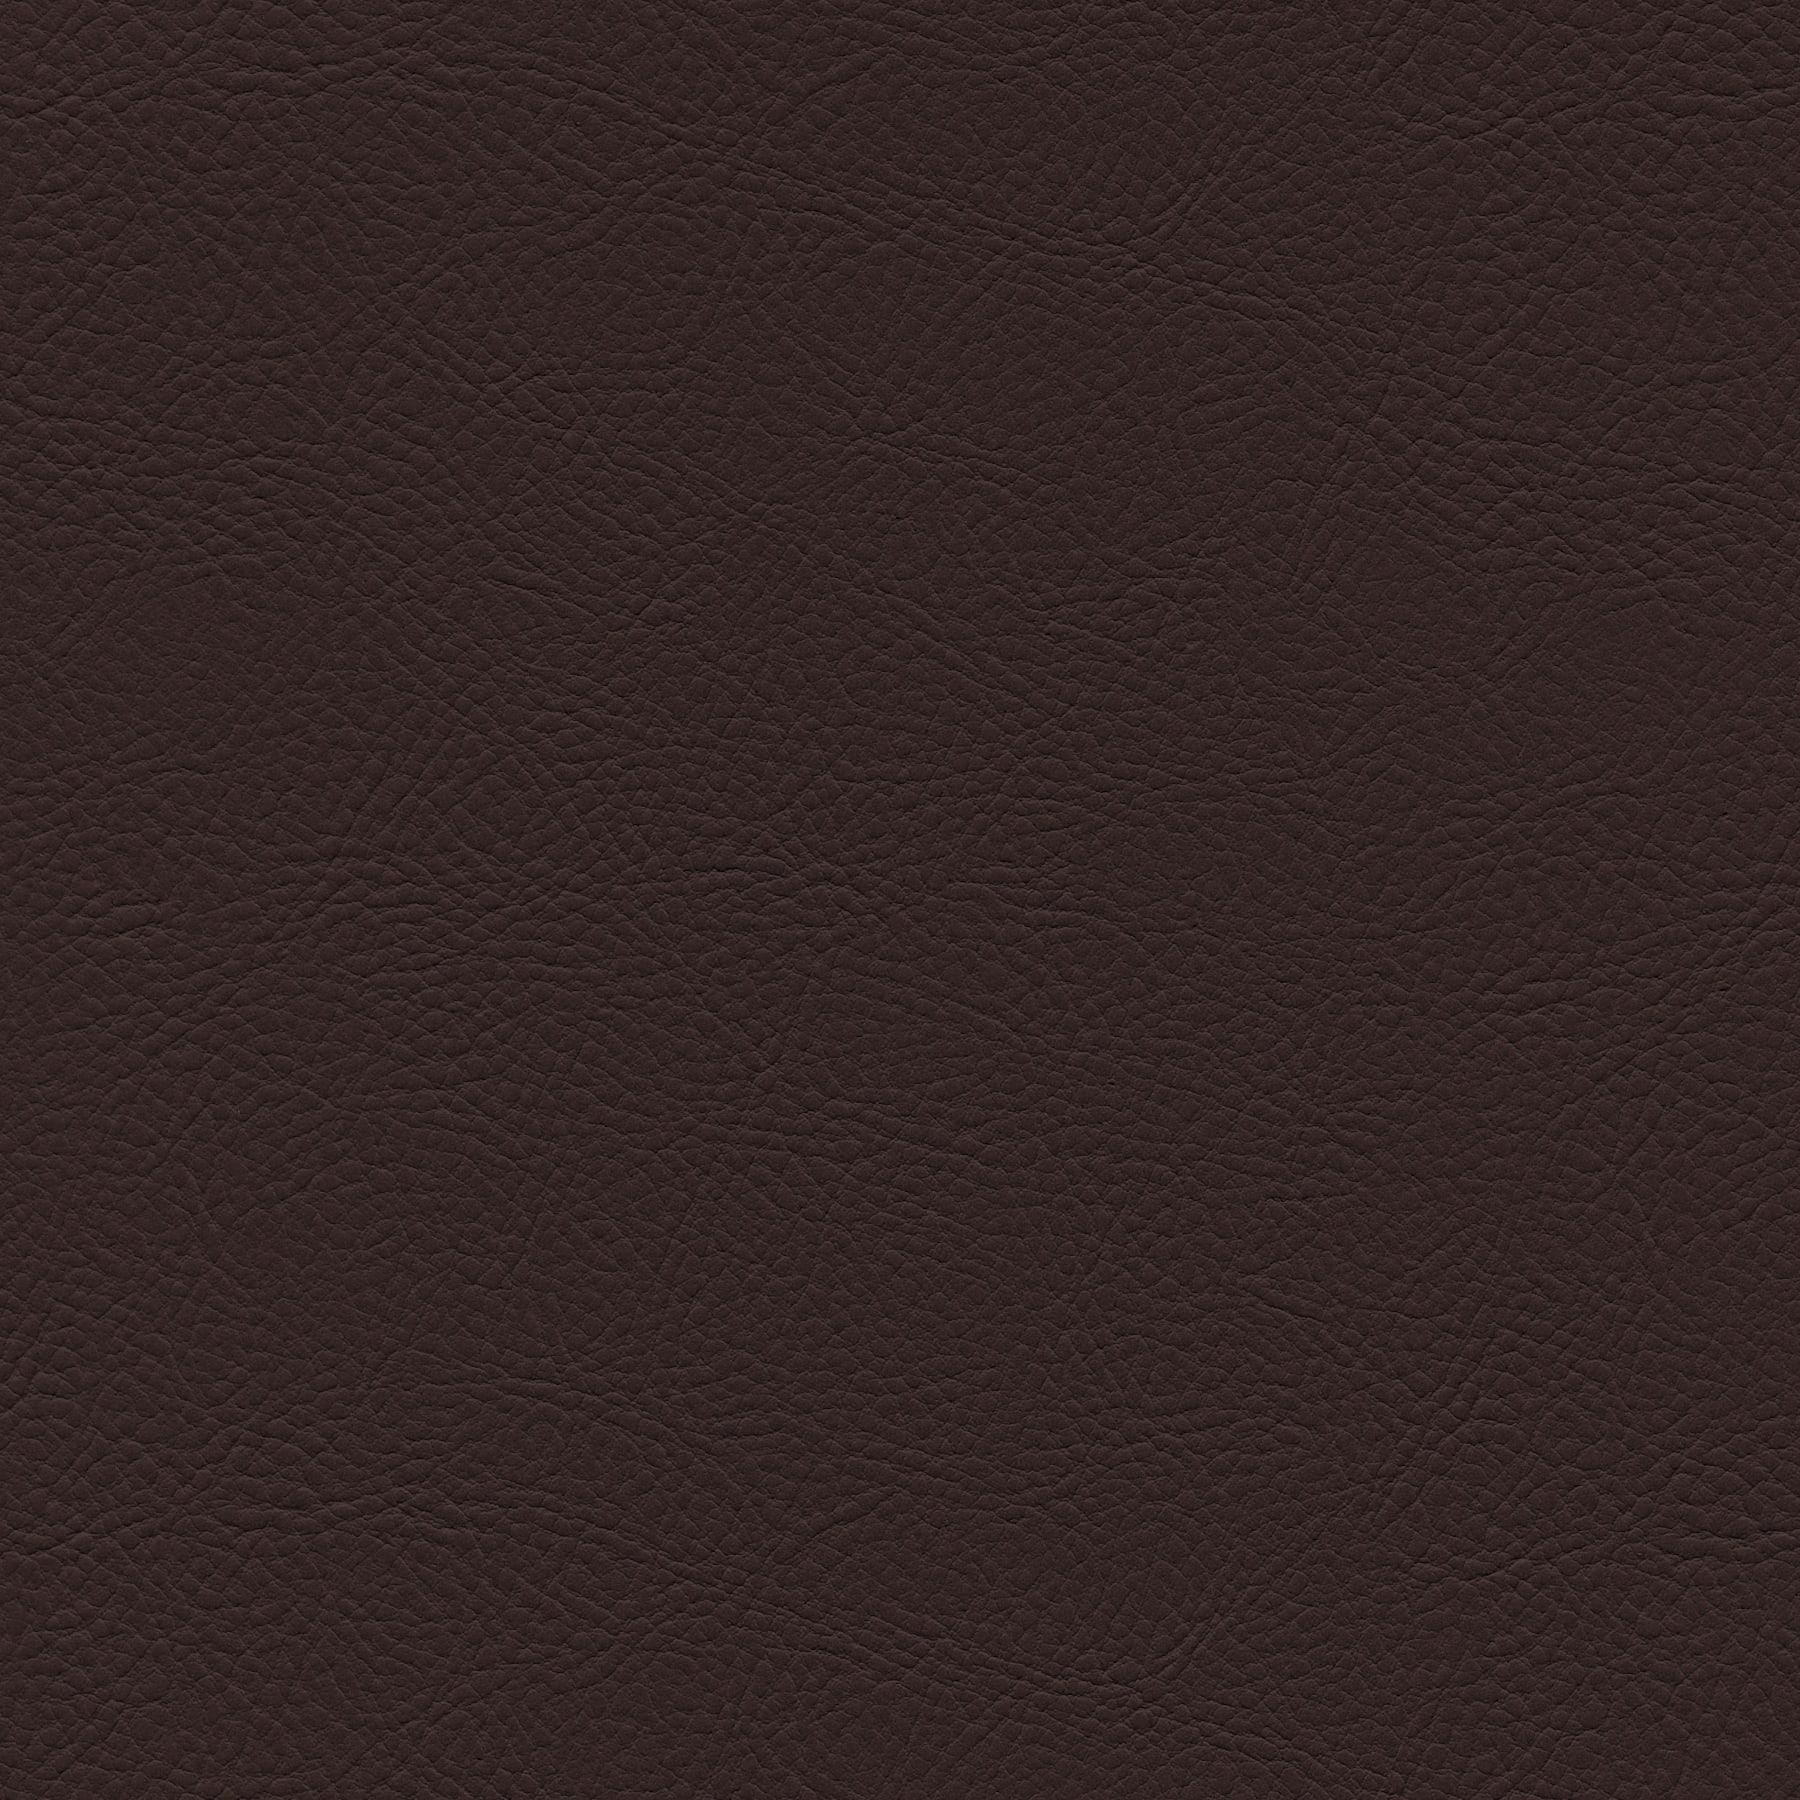 Leather-Burgundy-SR69